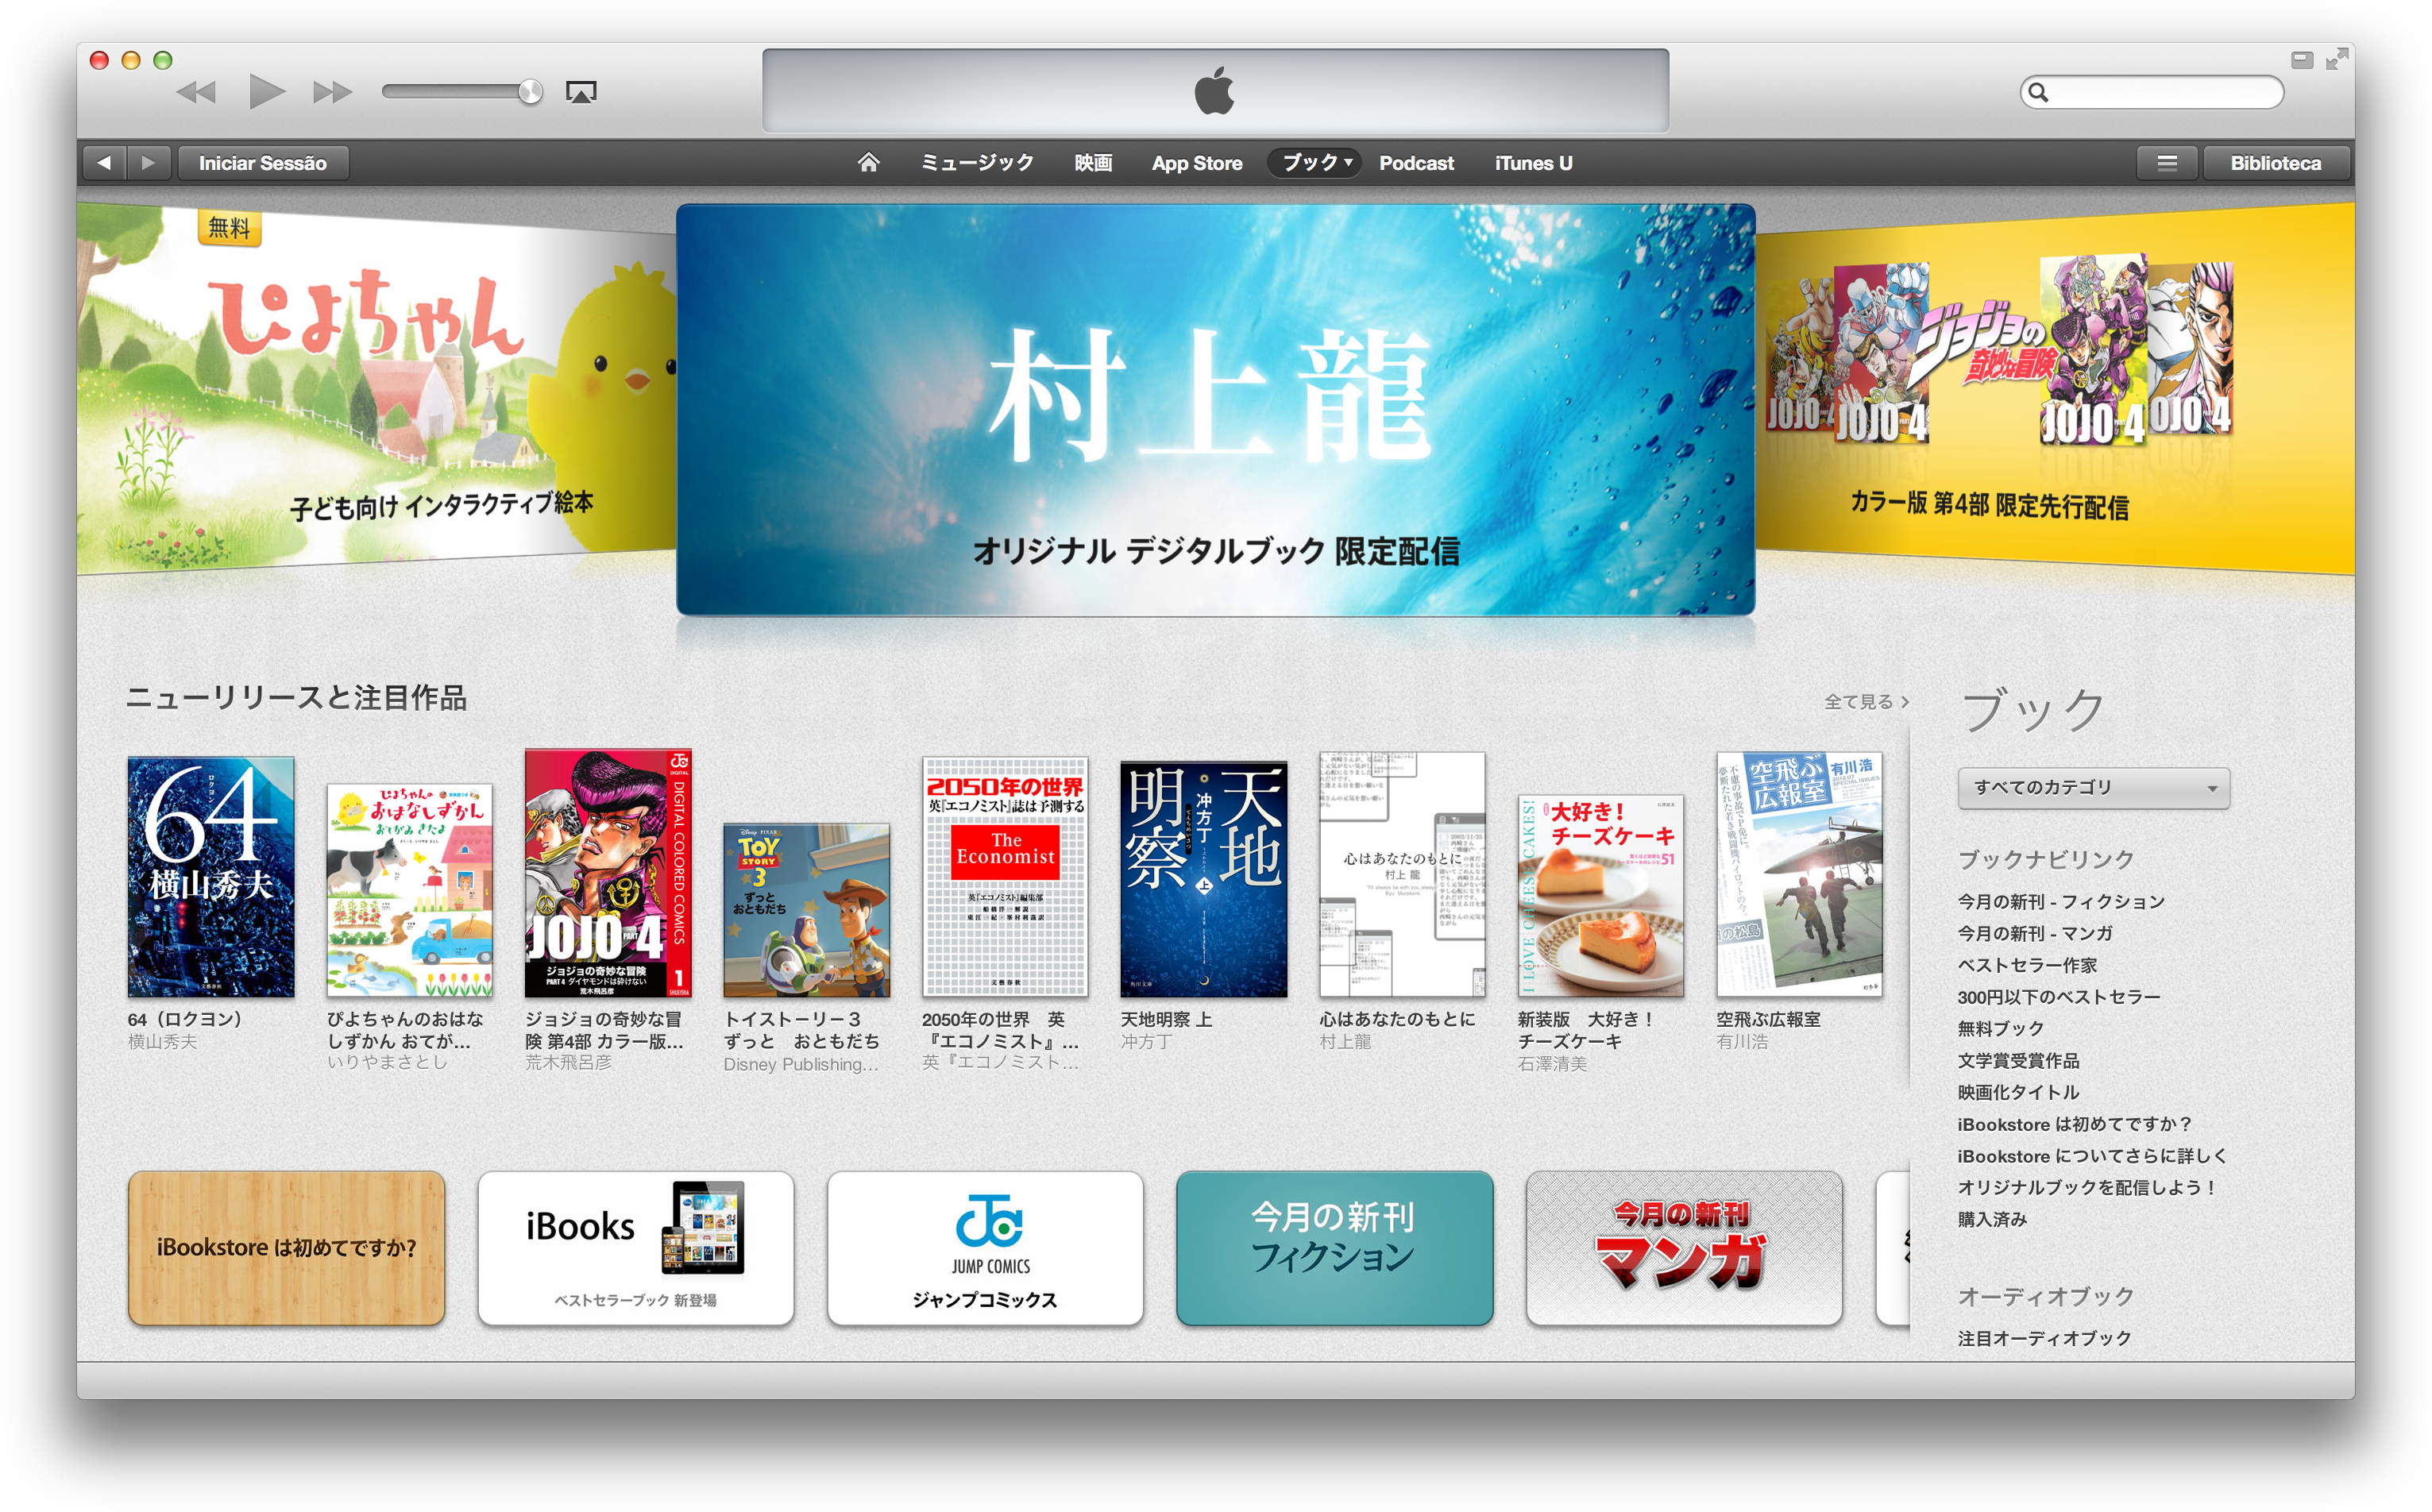 iBookstore japonesa